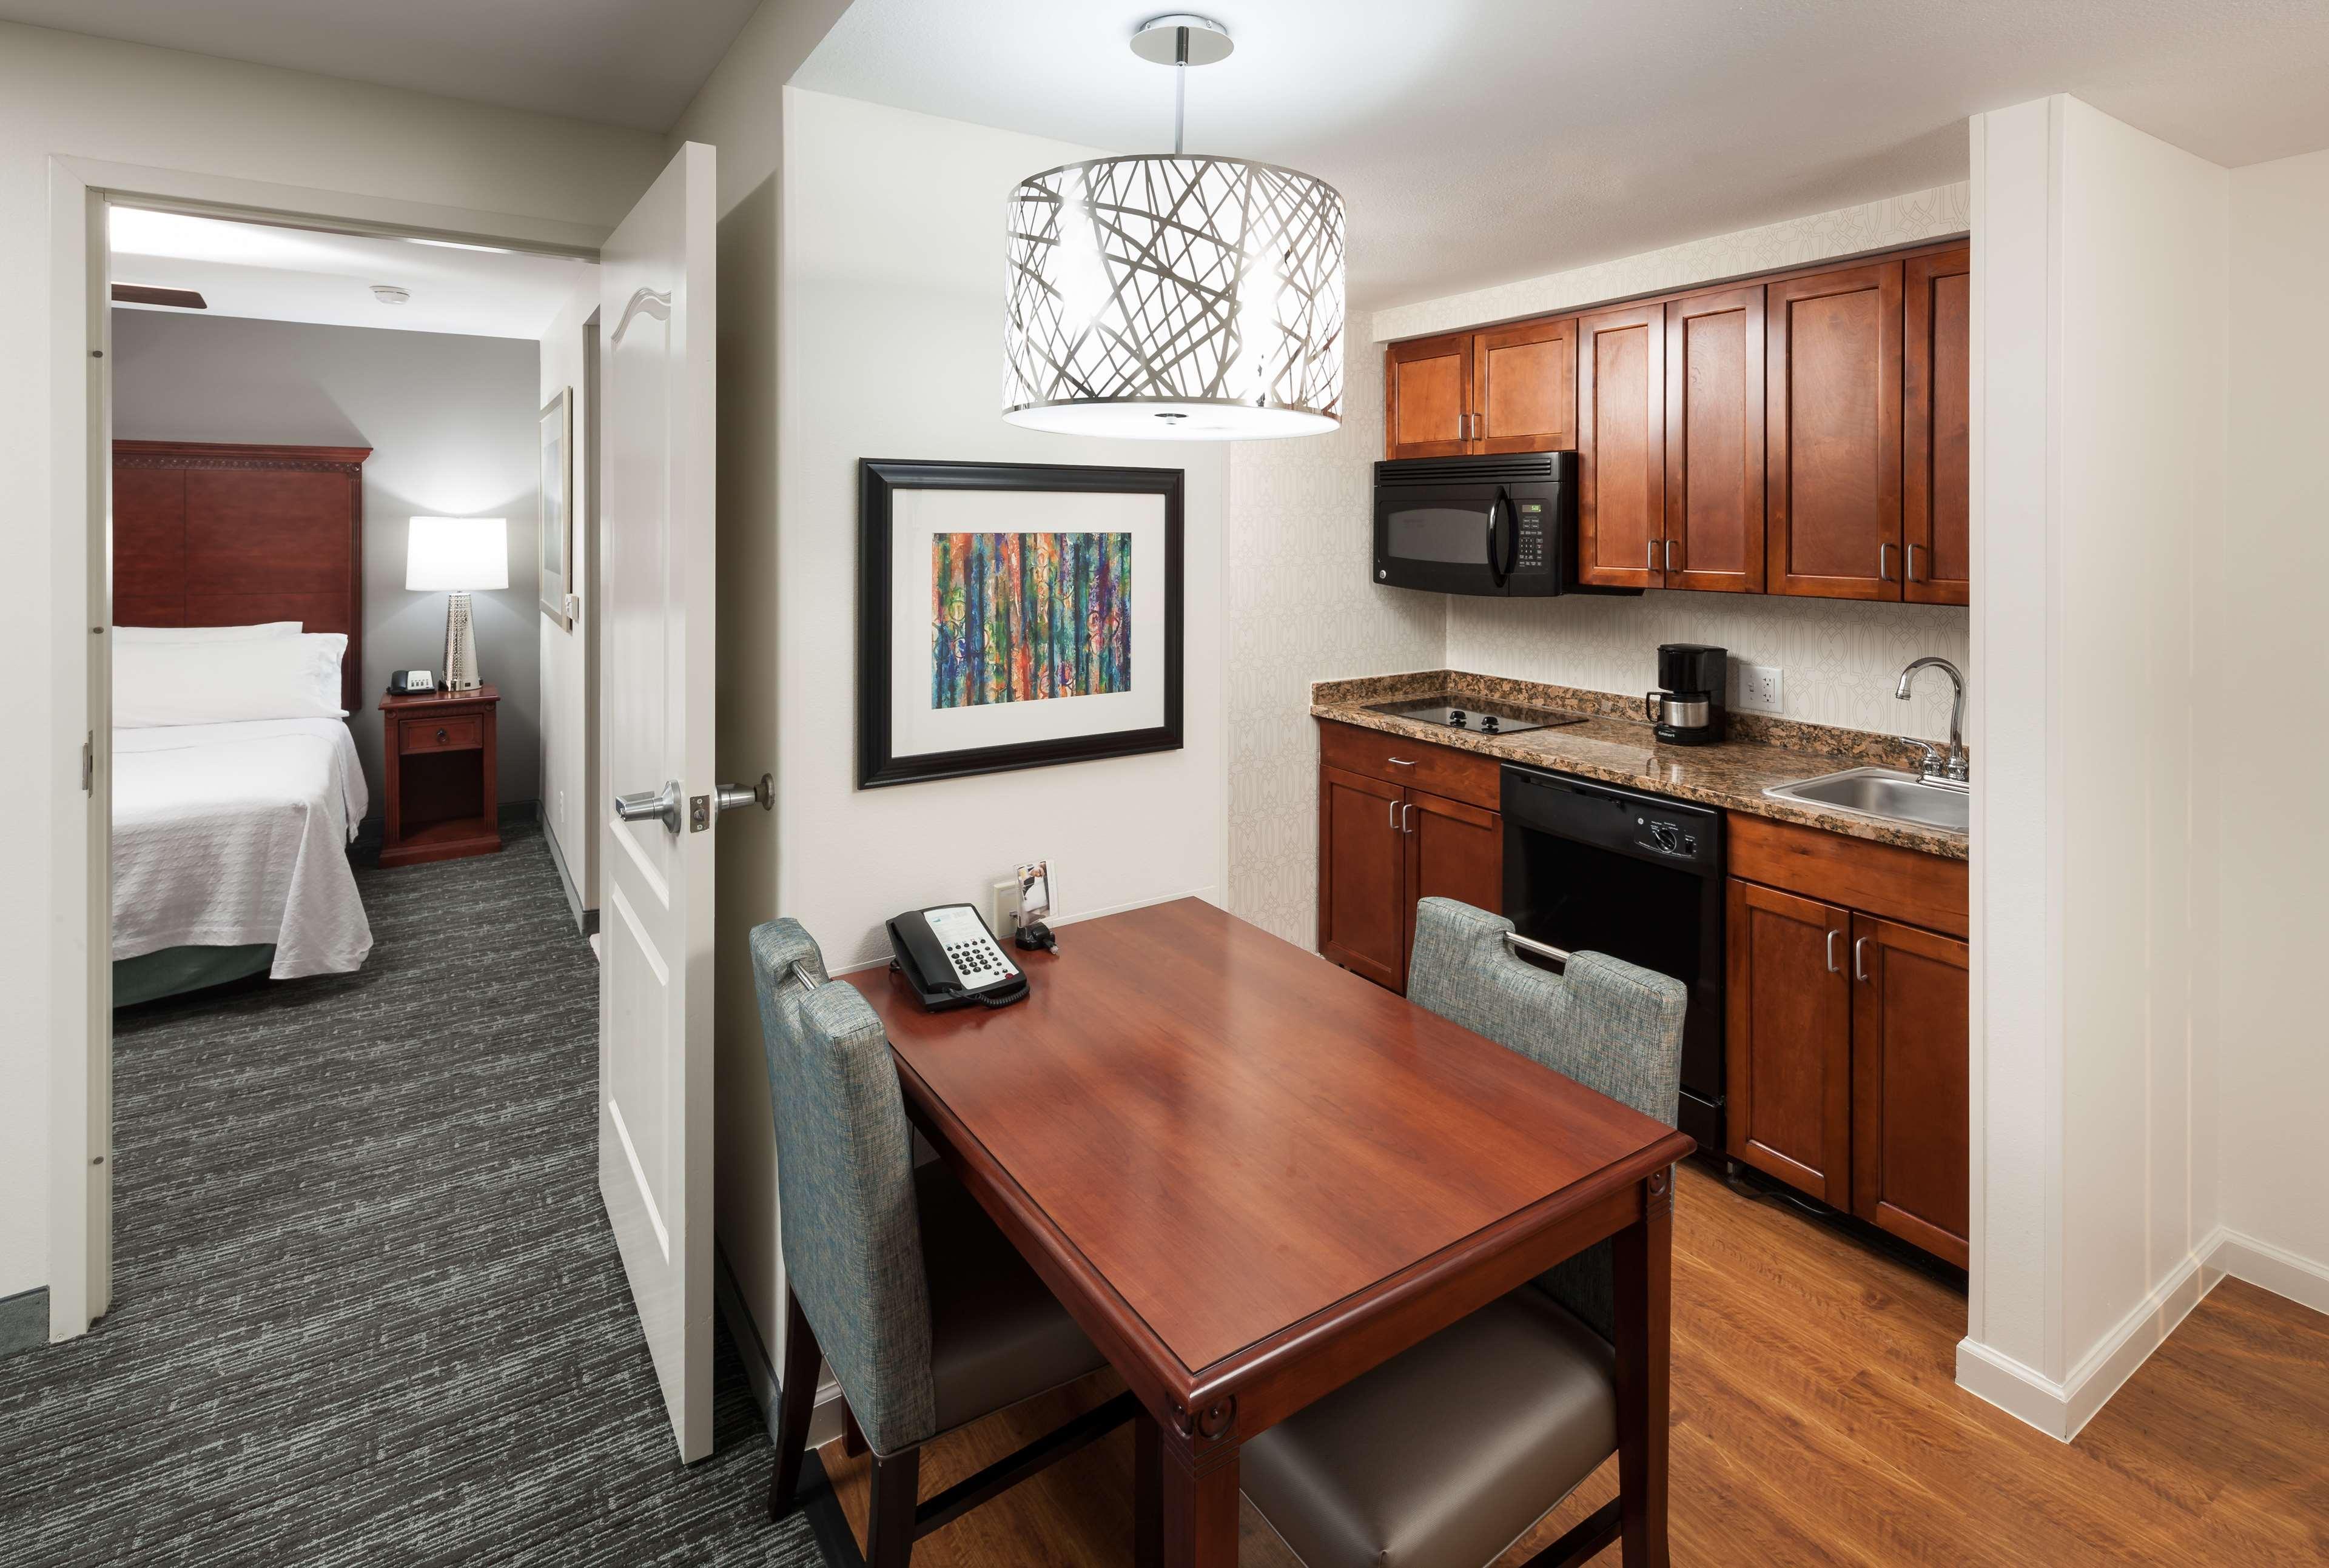 Homewood Suites by Hilton Denton image 22